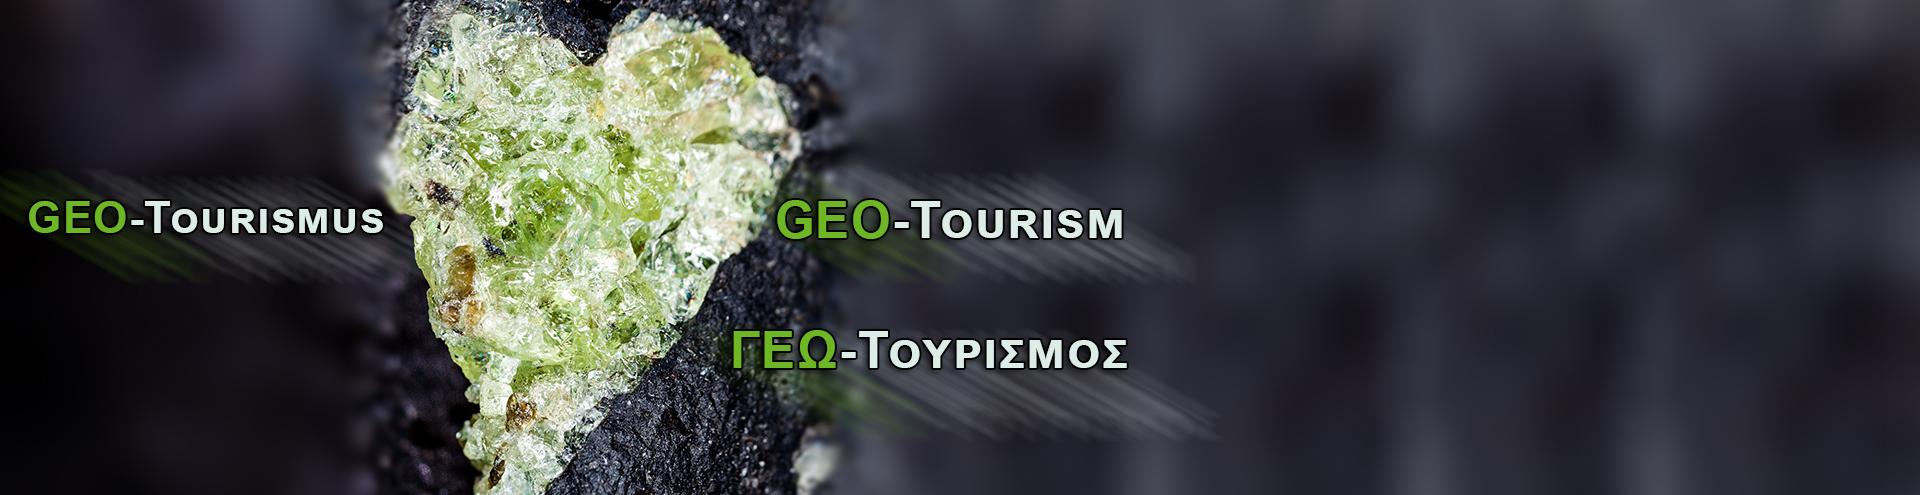 GeoTourismus